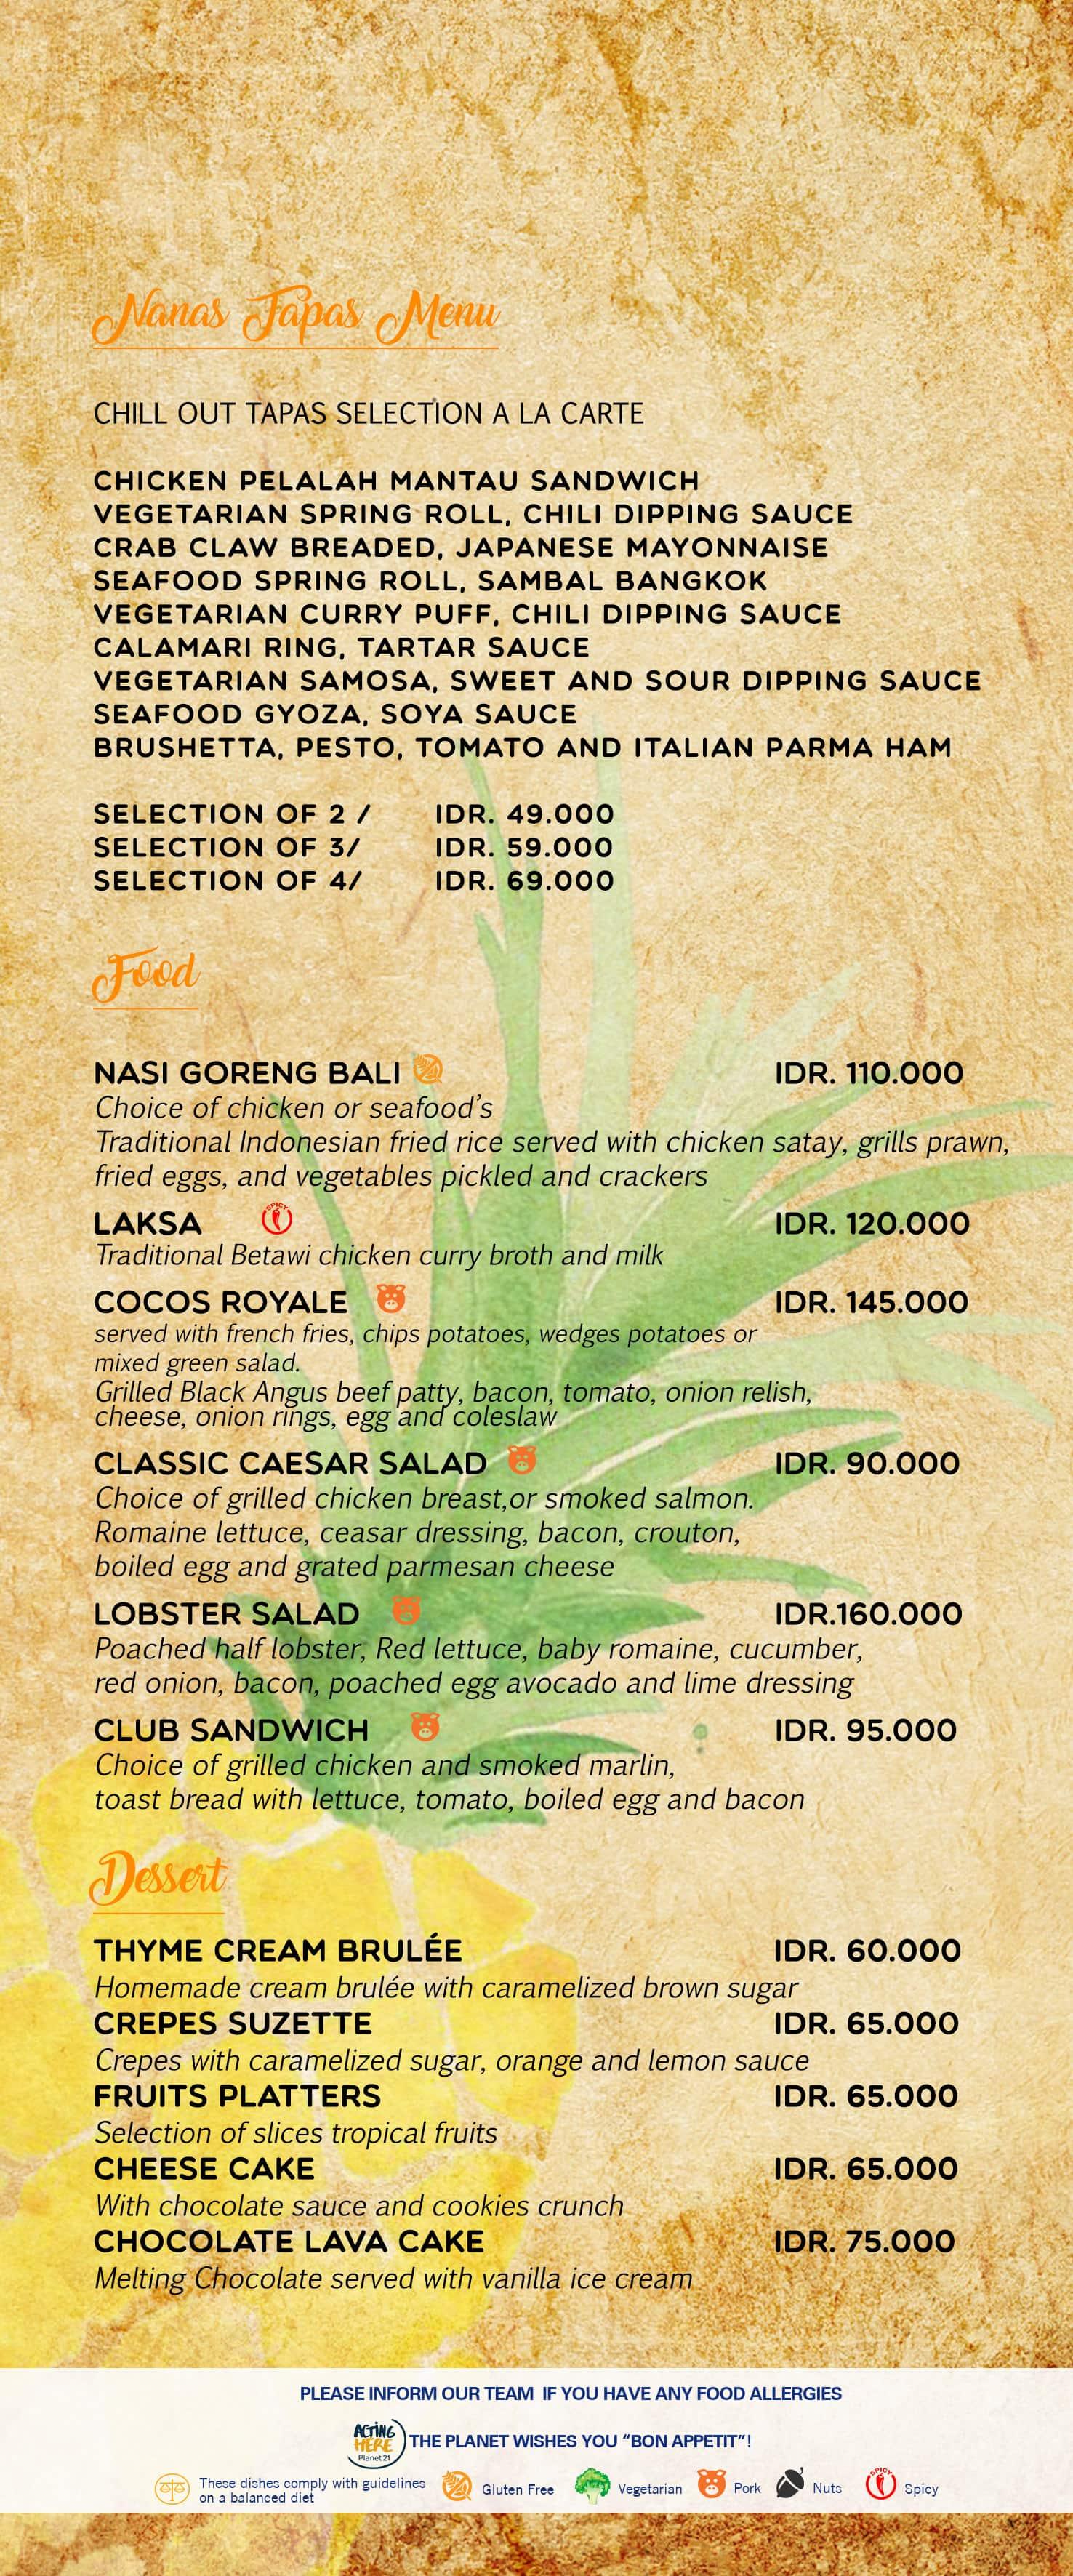 Carte Bali Benoa.Uluwatu Novotel Bali Benoa Hotel Menu Zomato Indonesia